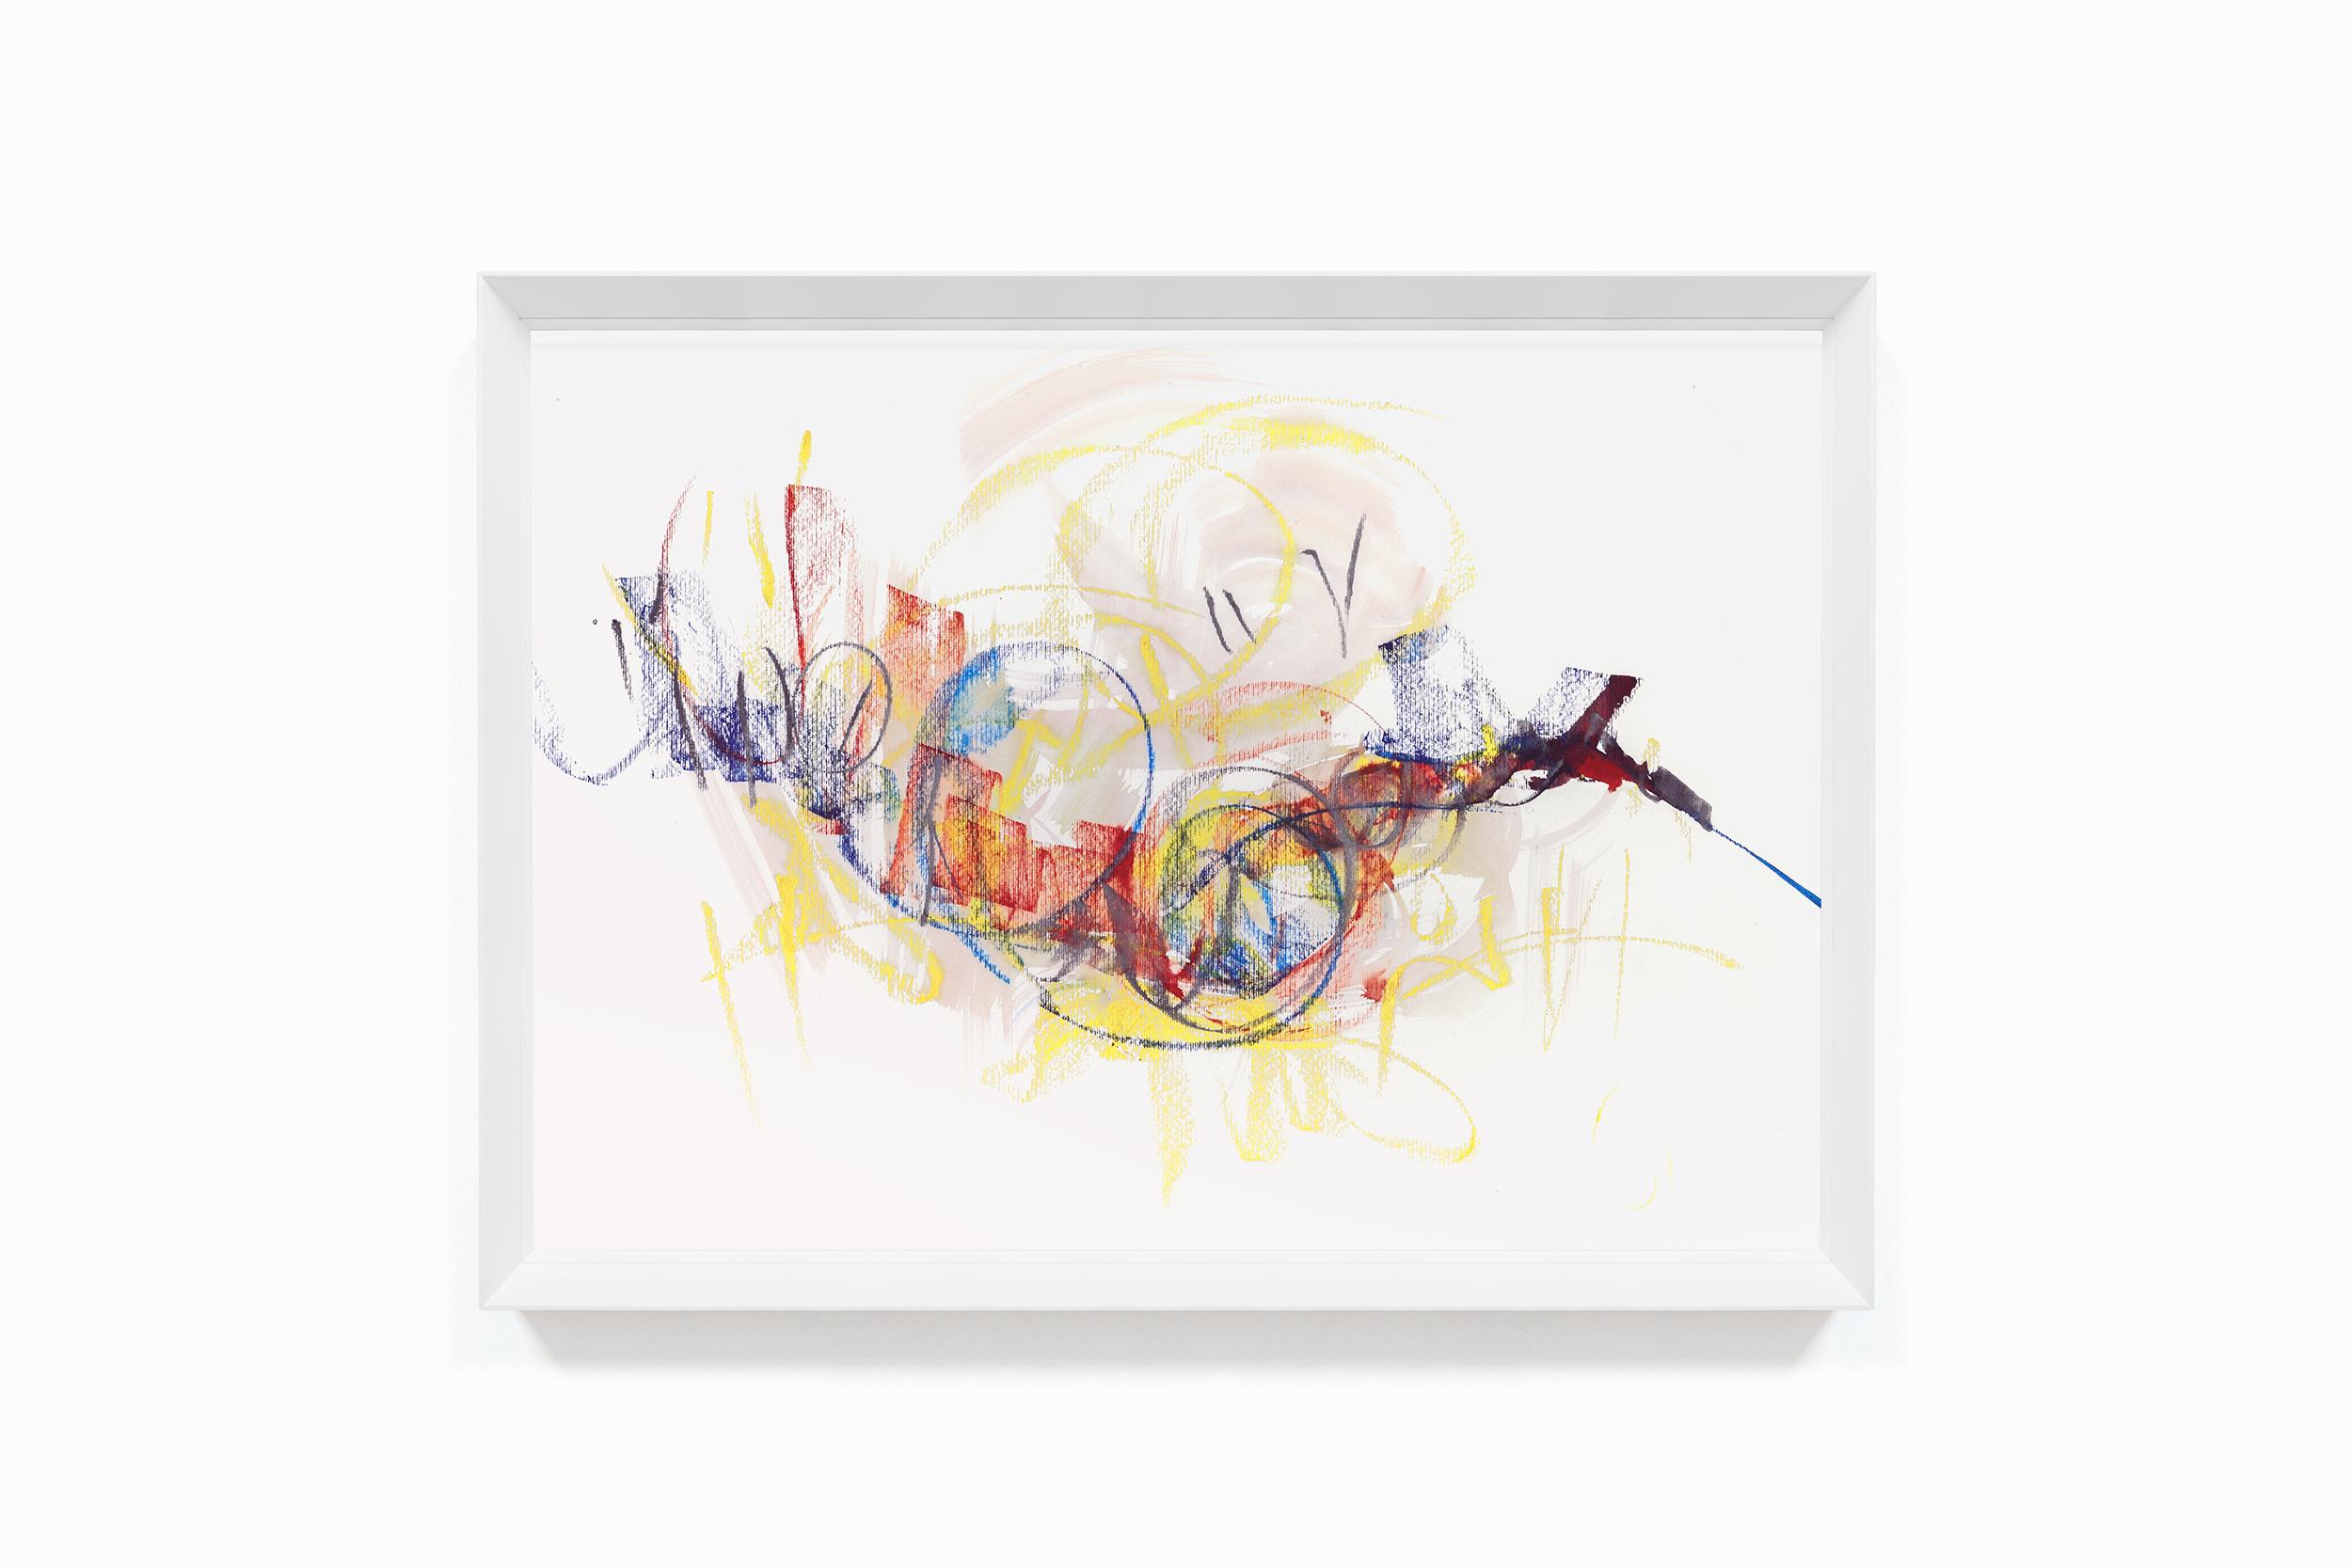 157B Andre Gigante Pintura Painting bonjourmolotov La.jpg